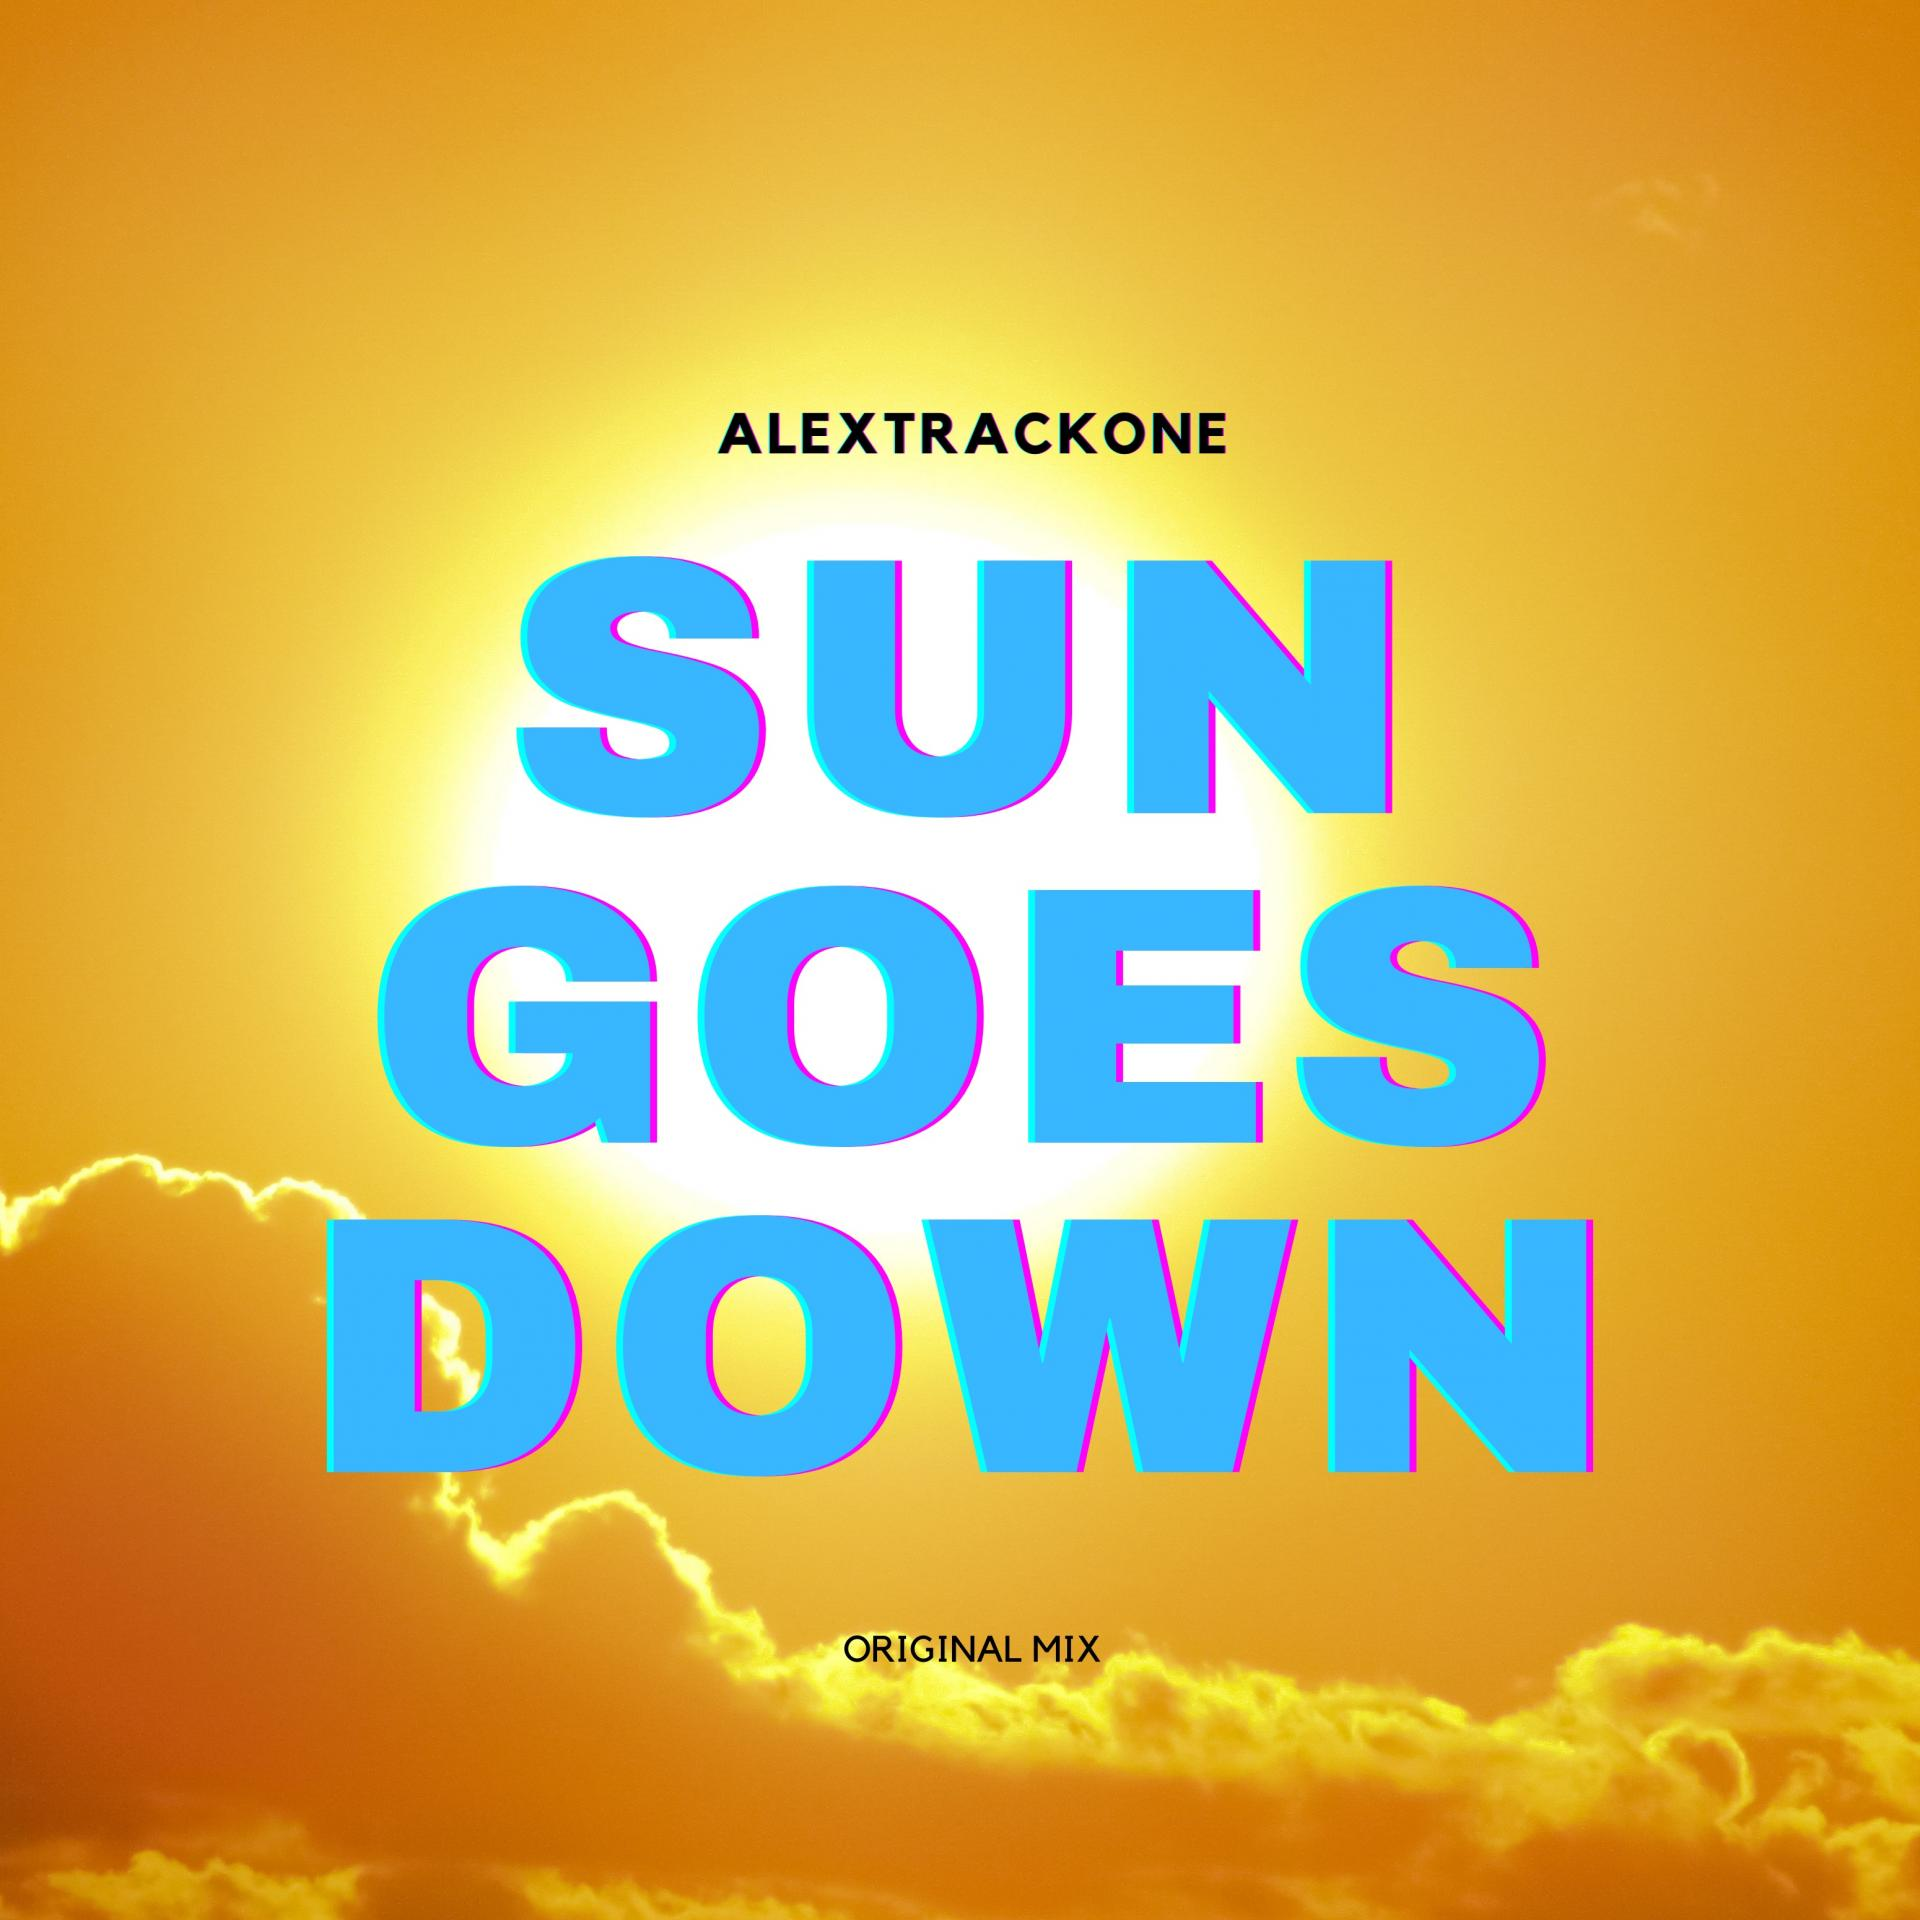 SUN GOES DOWN -ORIGINAL MIX-